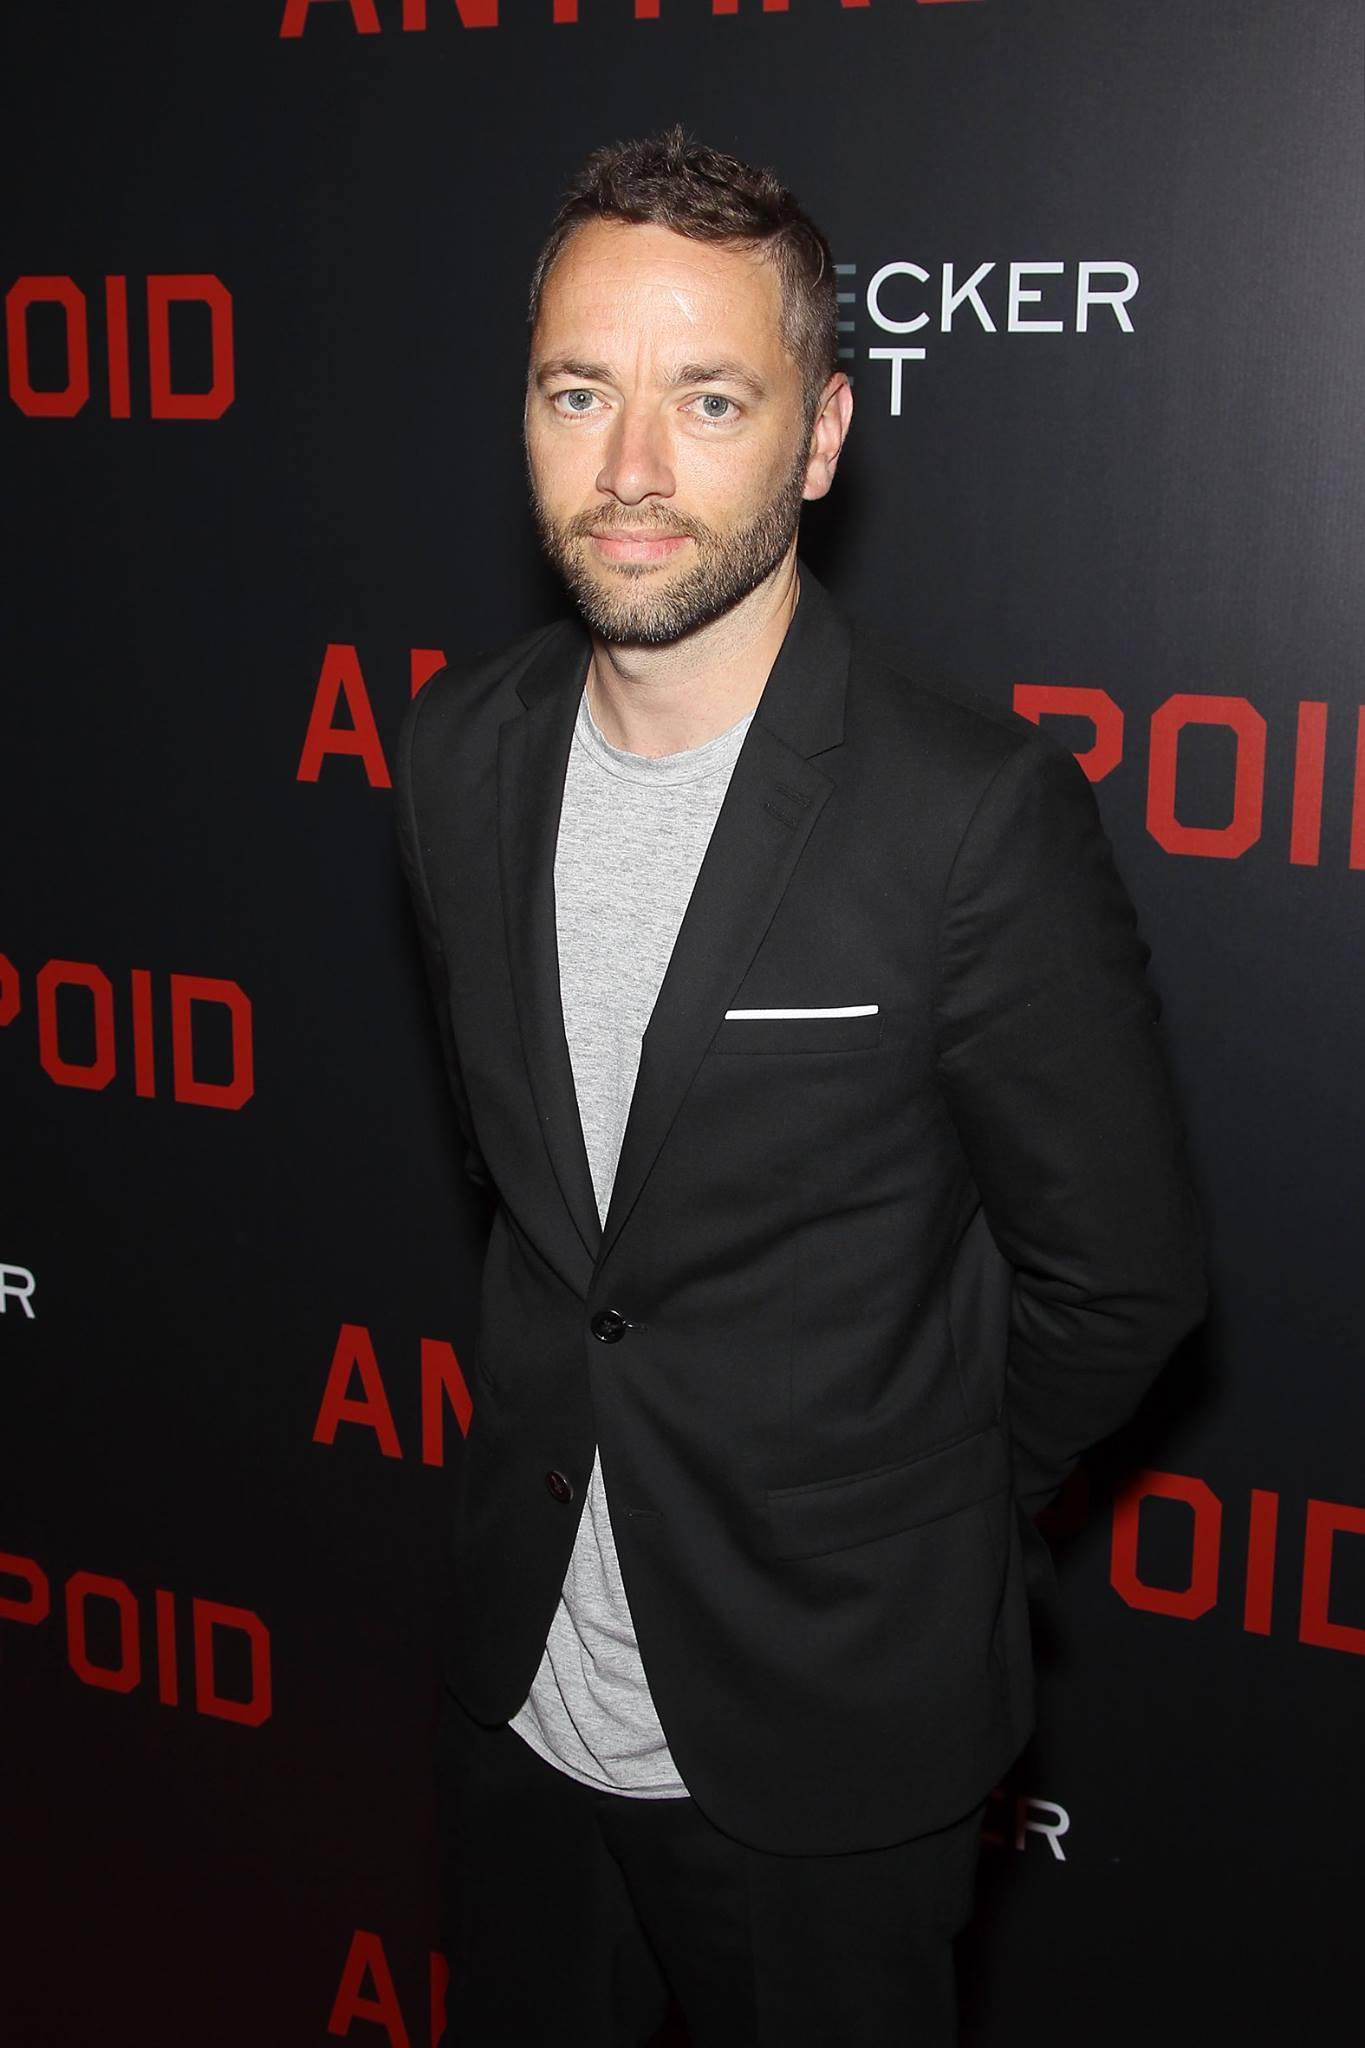 Director Sean Ellis